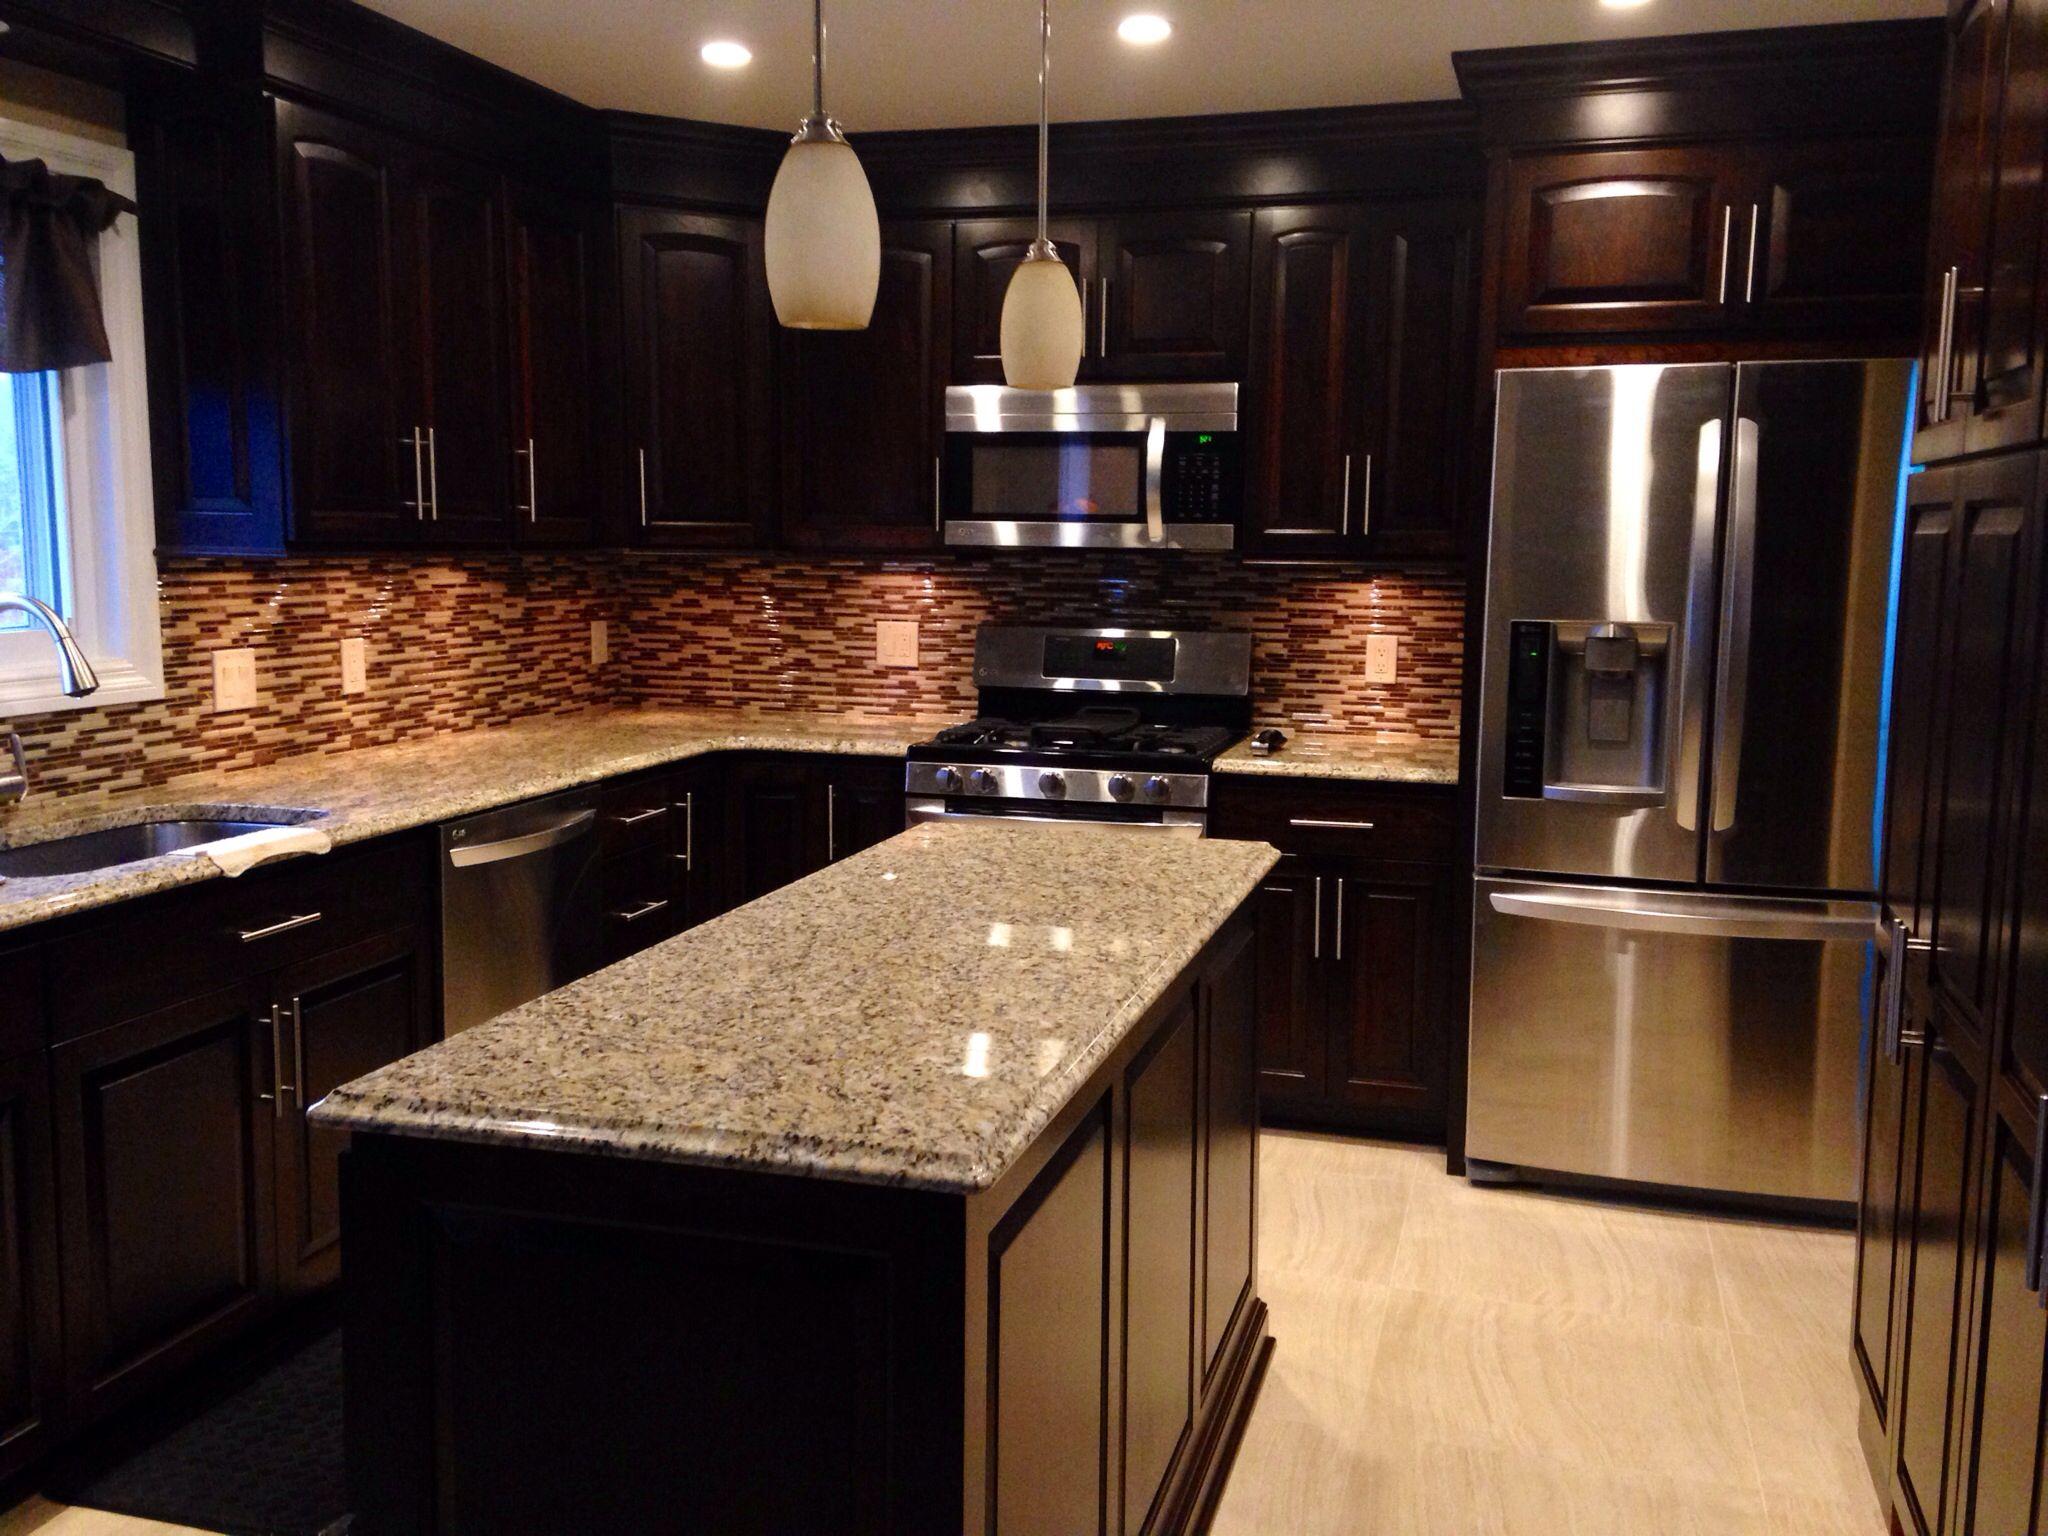 Dark cherry cabinets, granite countertops with light tile ...